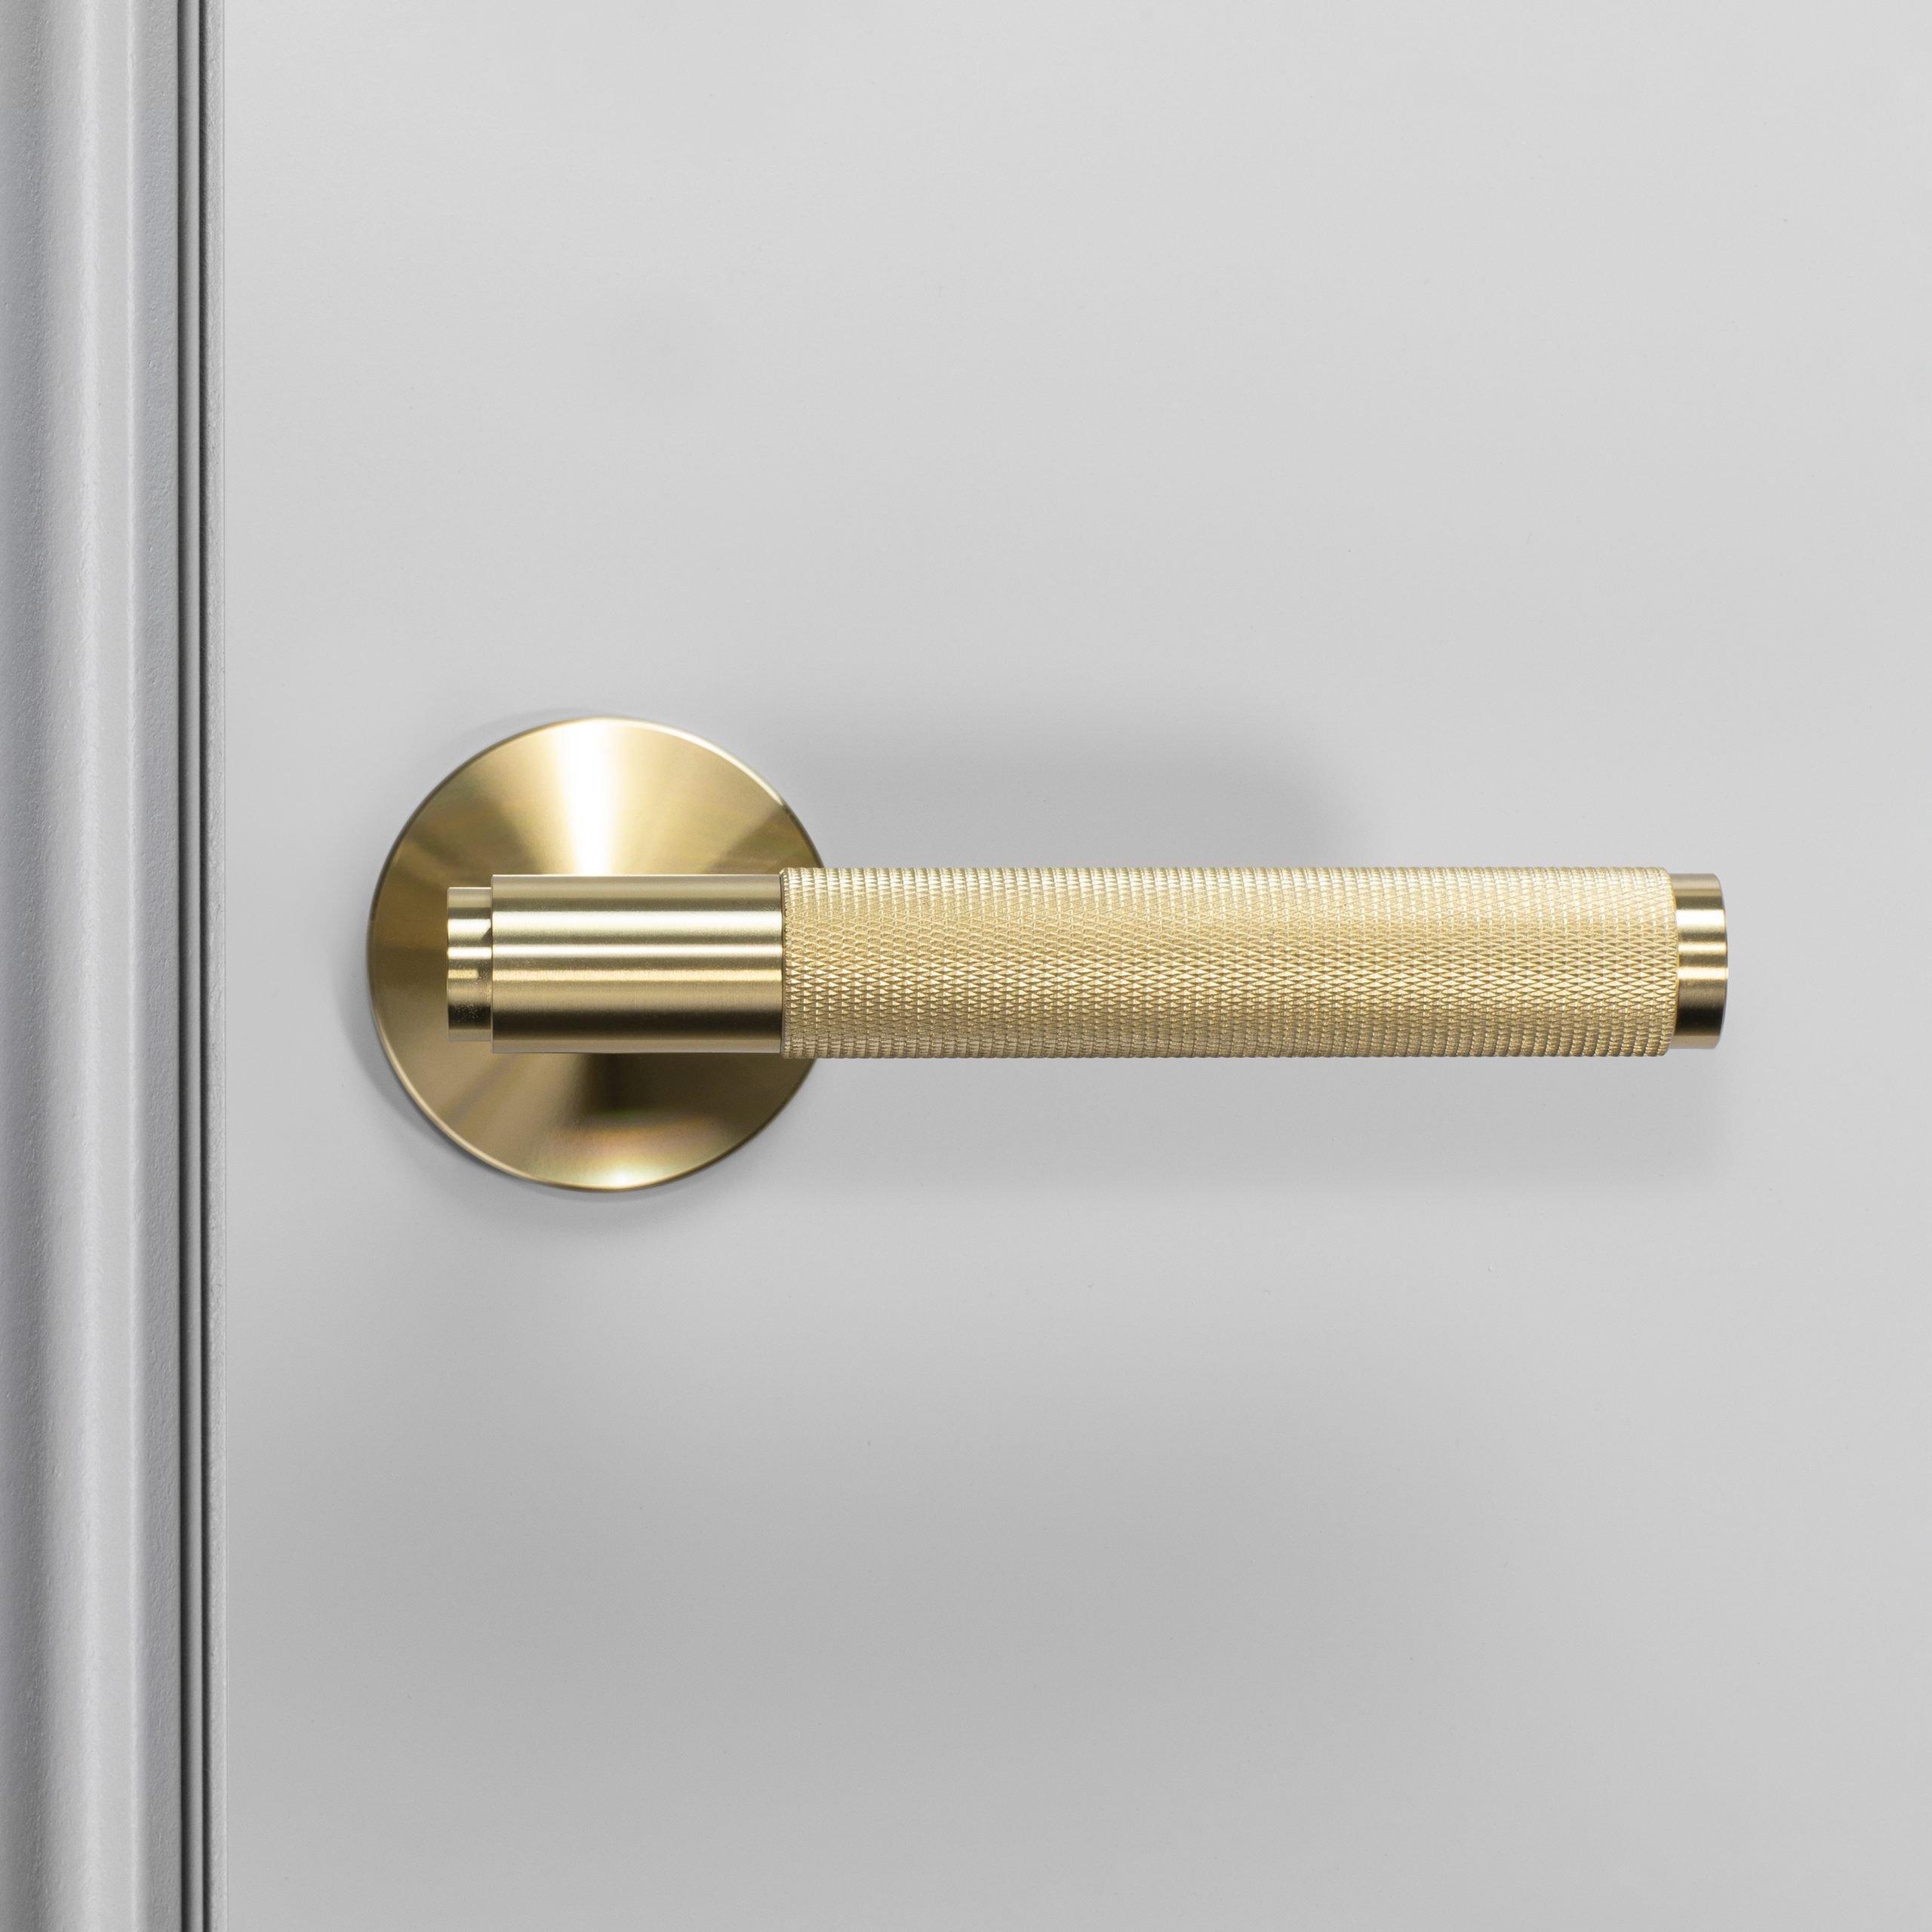 2. Buster+Punch_Door_Handle_Front_Fixed_Brass